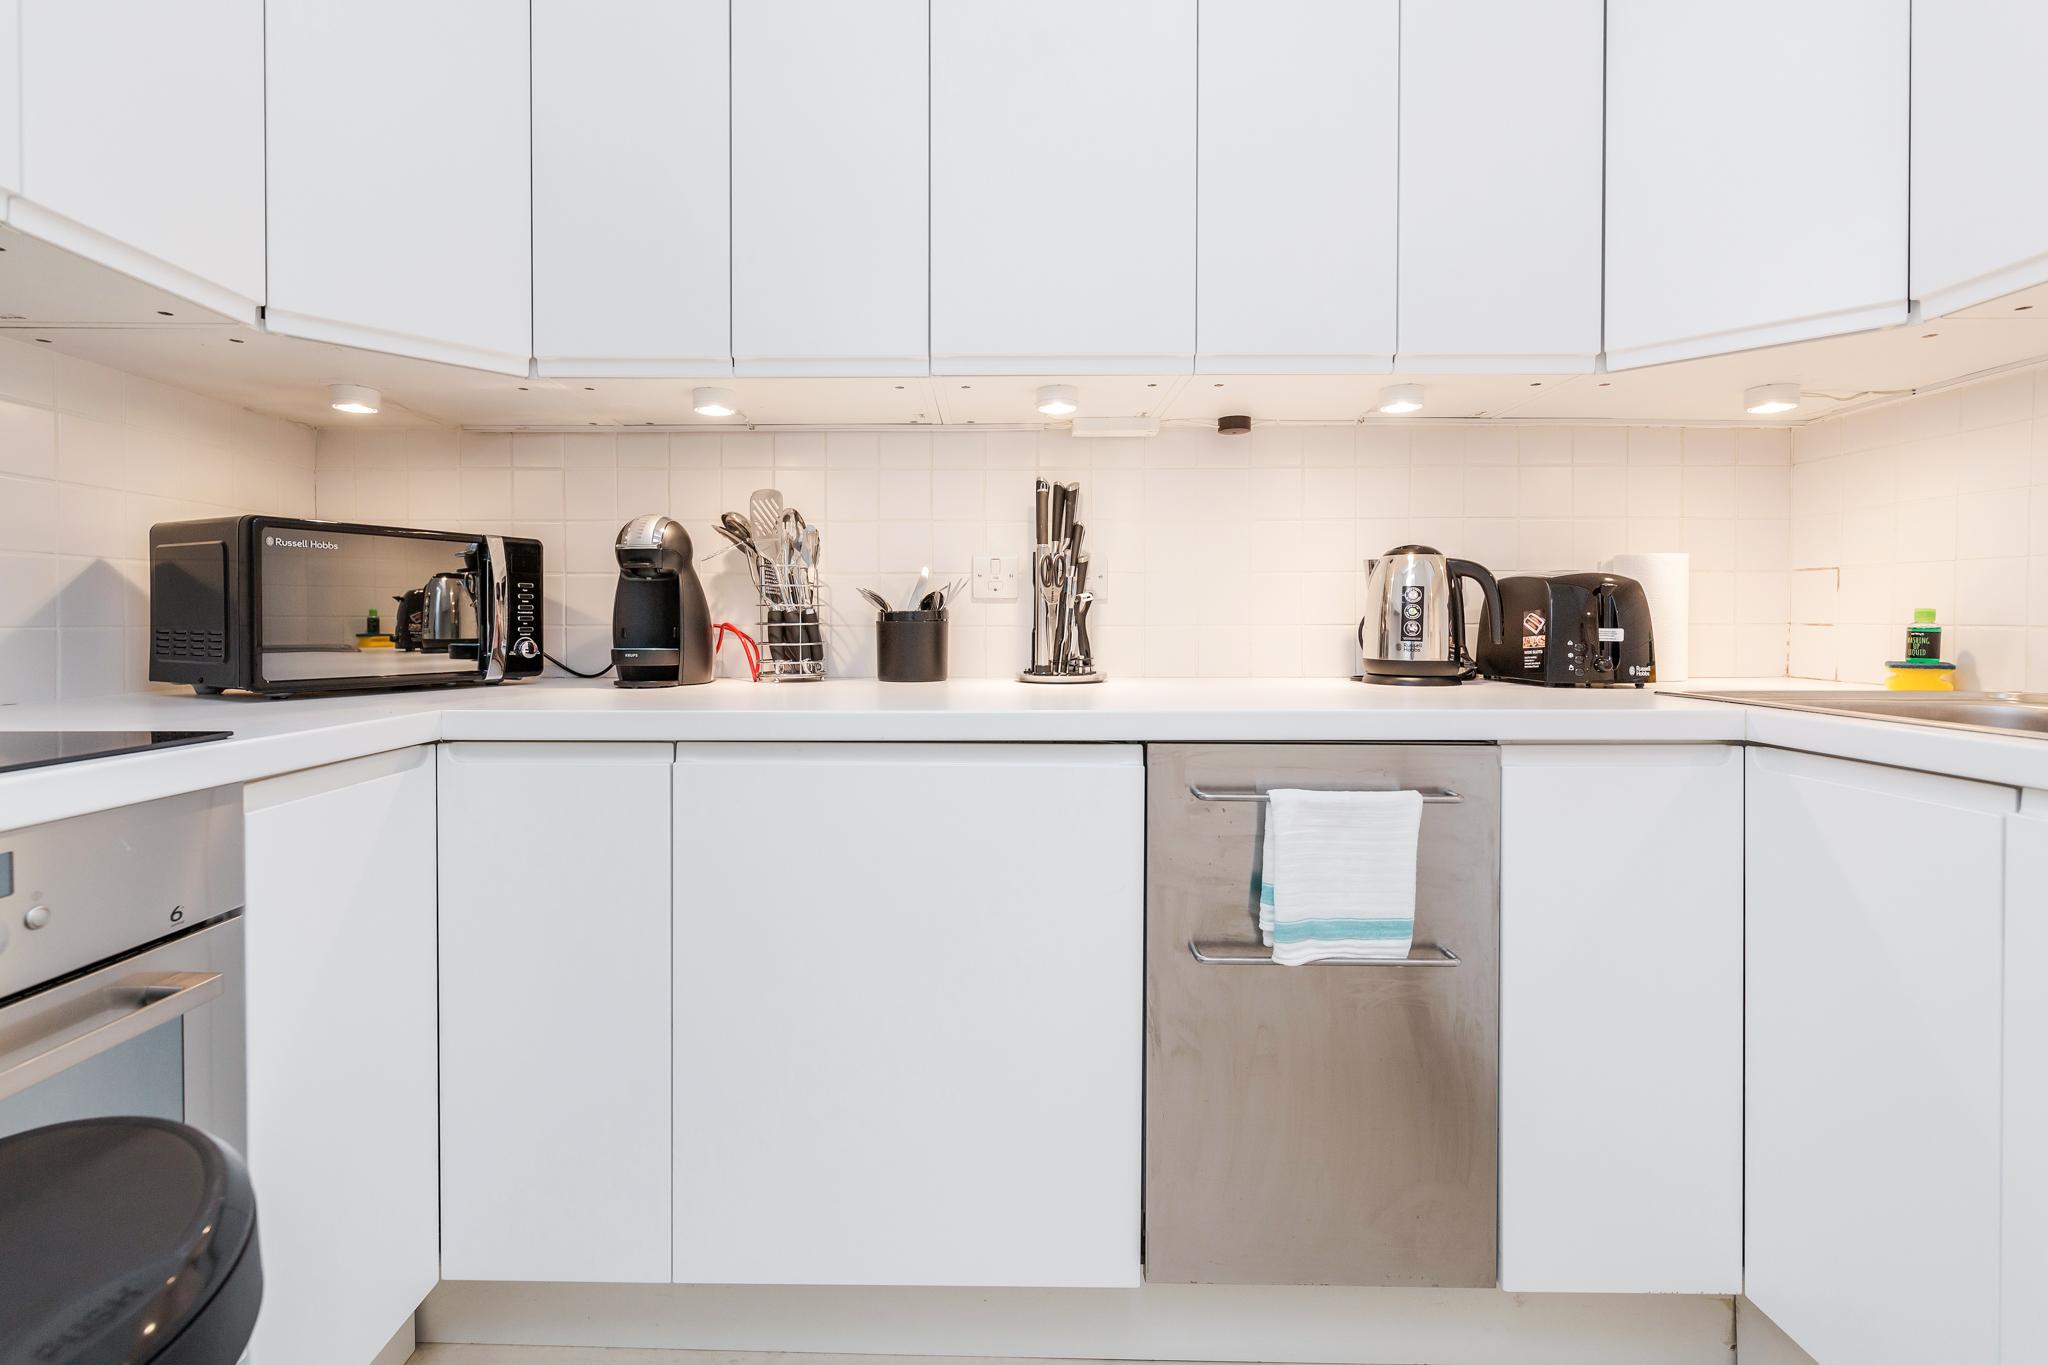 Apartment Distinctive Kensington apt for 3 with Mezzanine photo 23290241